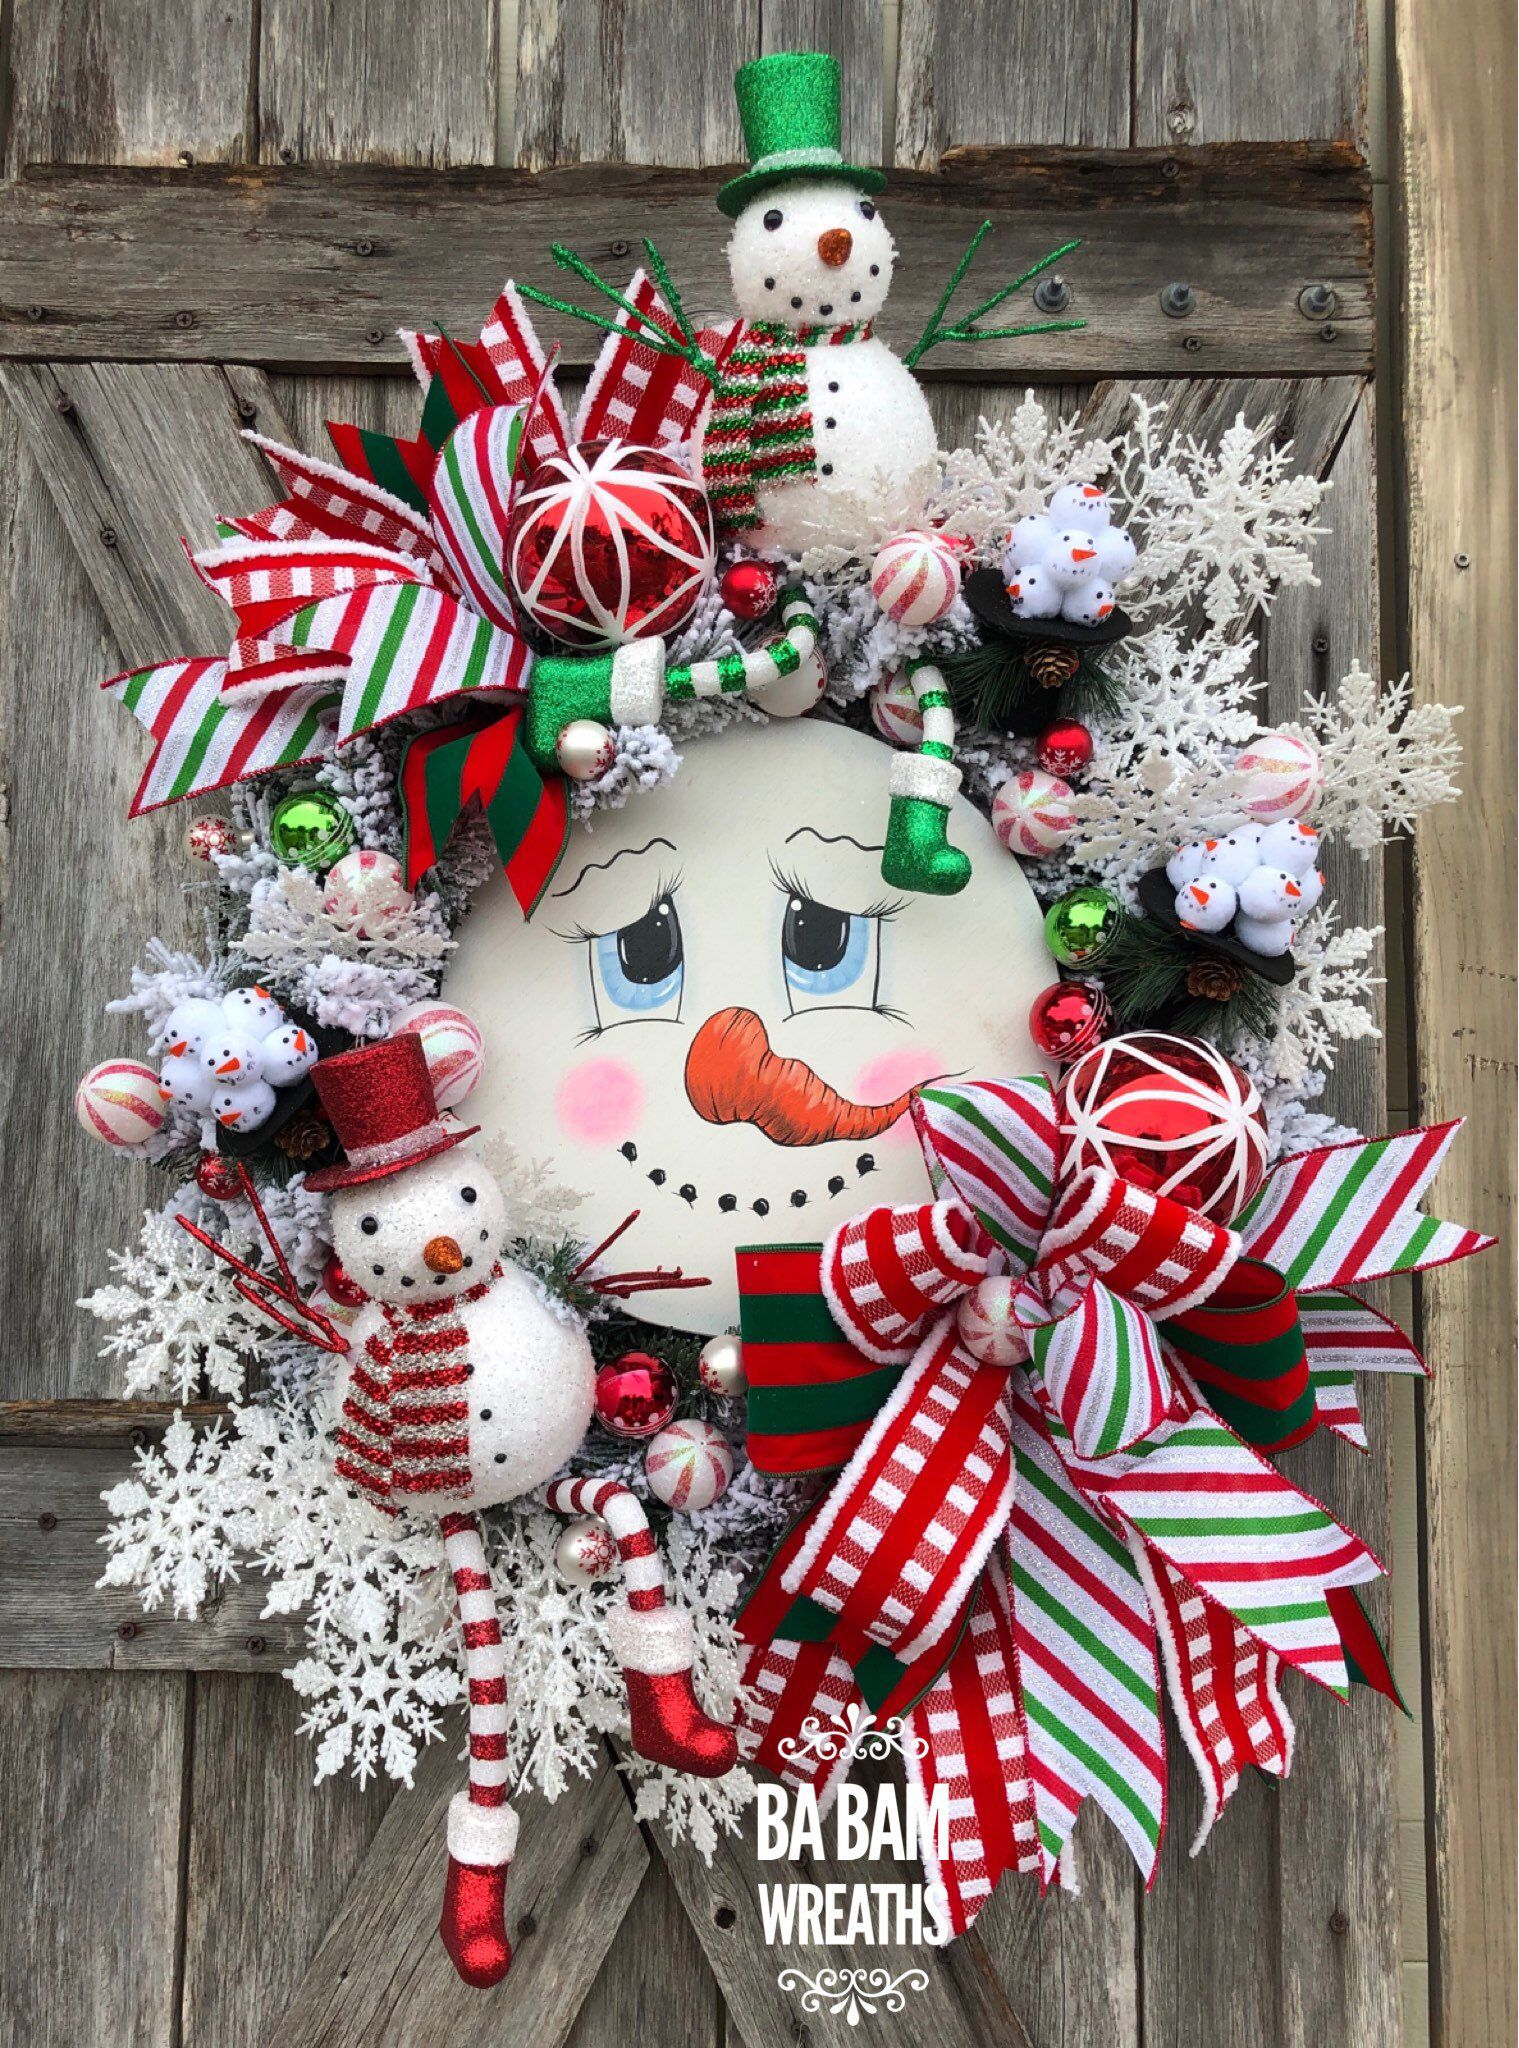 Ba Bam Wreaths Snowman Wreath Snowman Decor Christmas Wreath Traditional Chr Paper Christmas Decorations Christmas Crafts Decorations Christmas Decorations